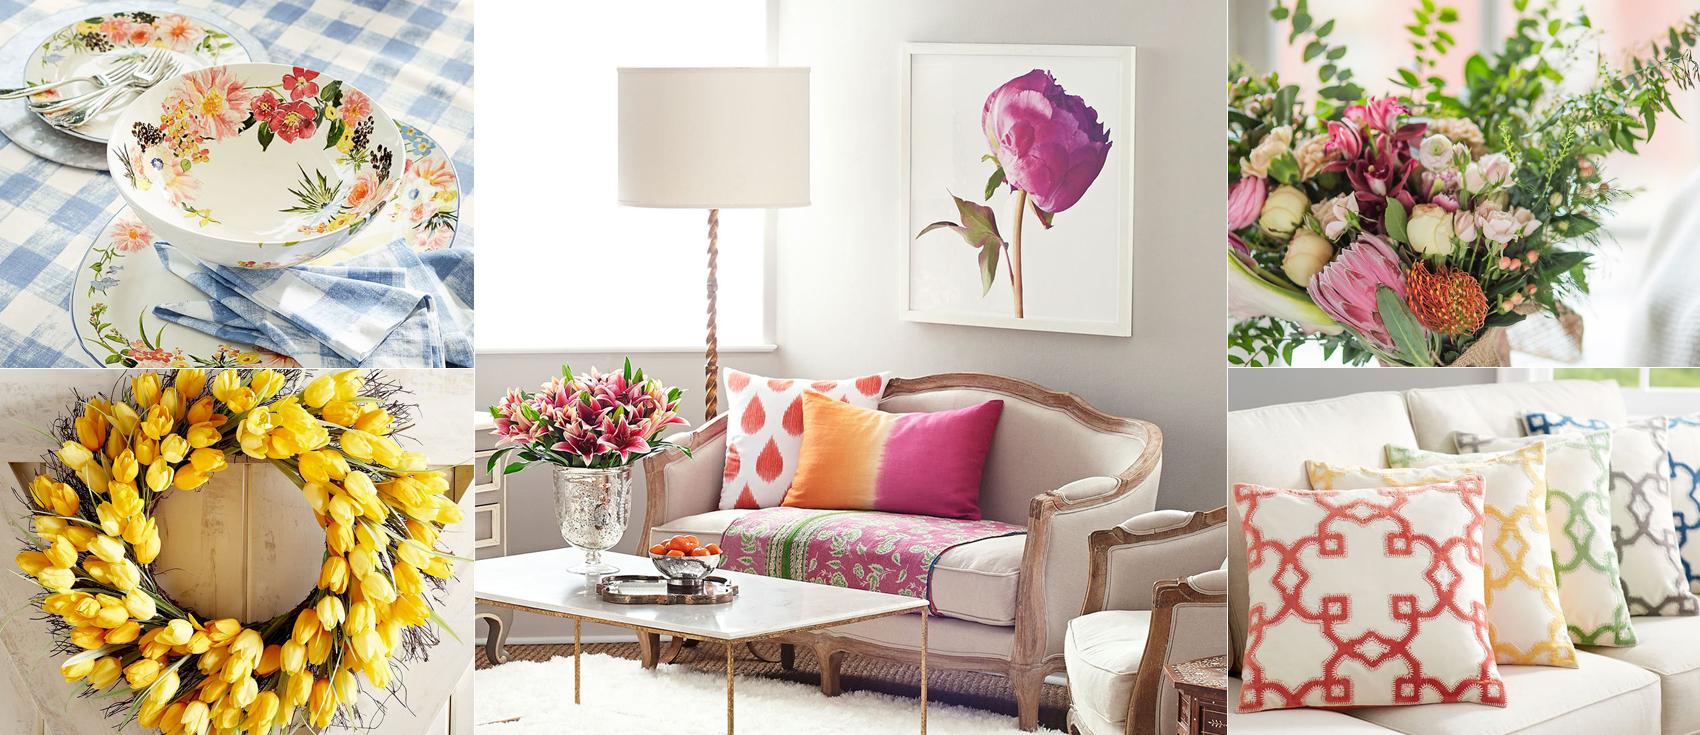 Spring Decor Spring Decor  Spring Decorating Tips & Ideas  Buyer Select